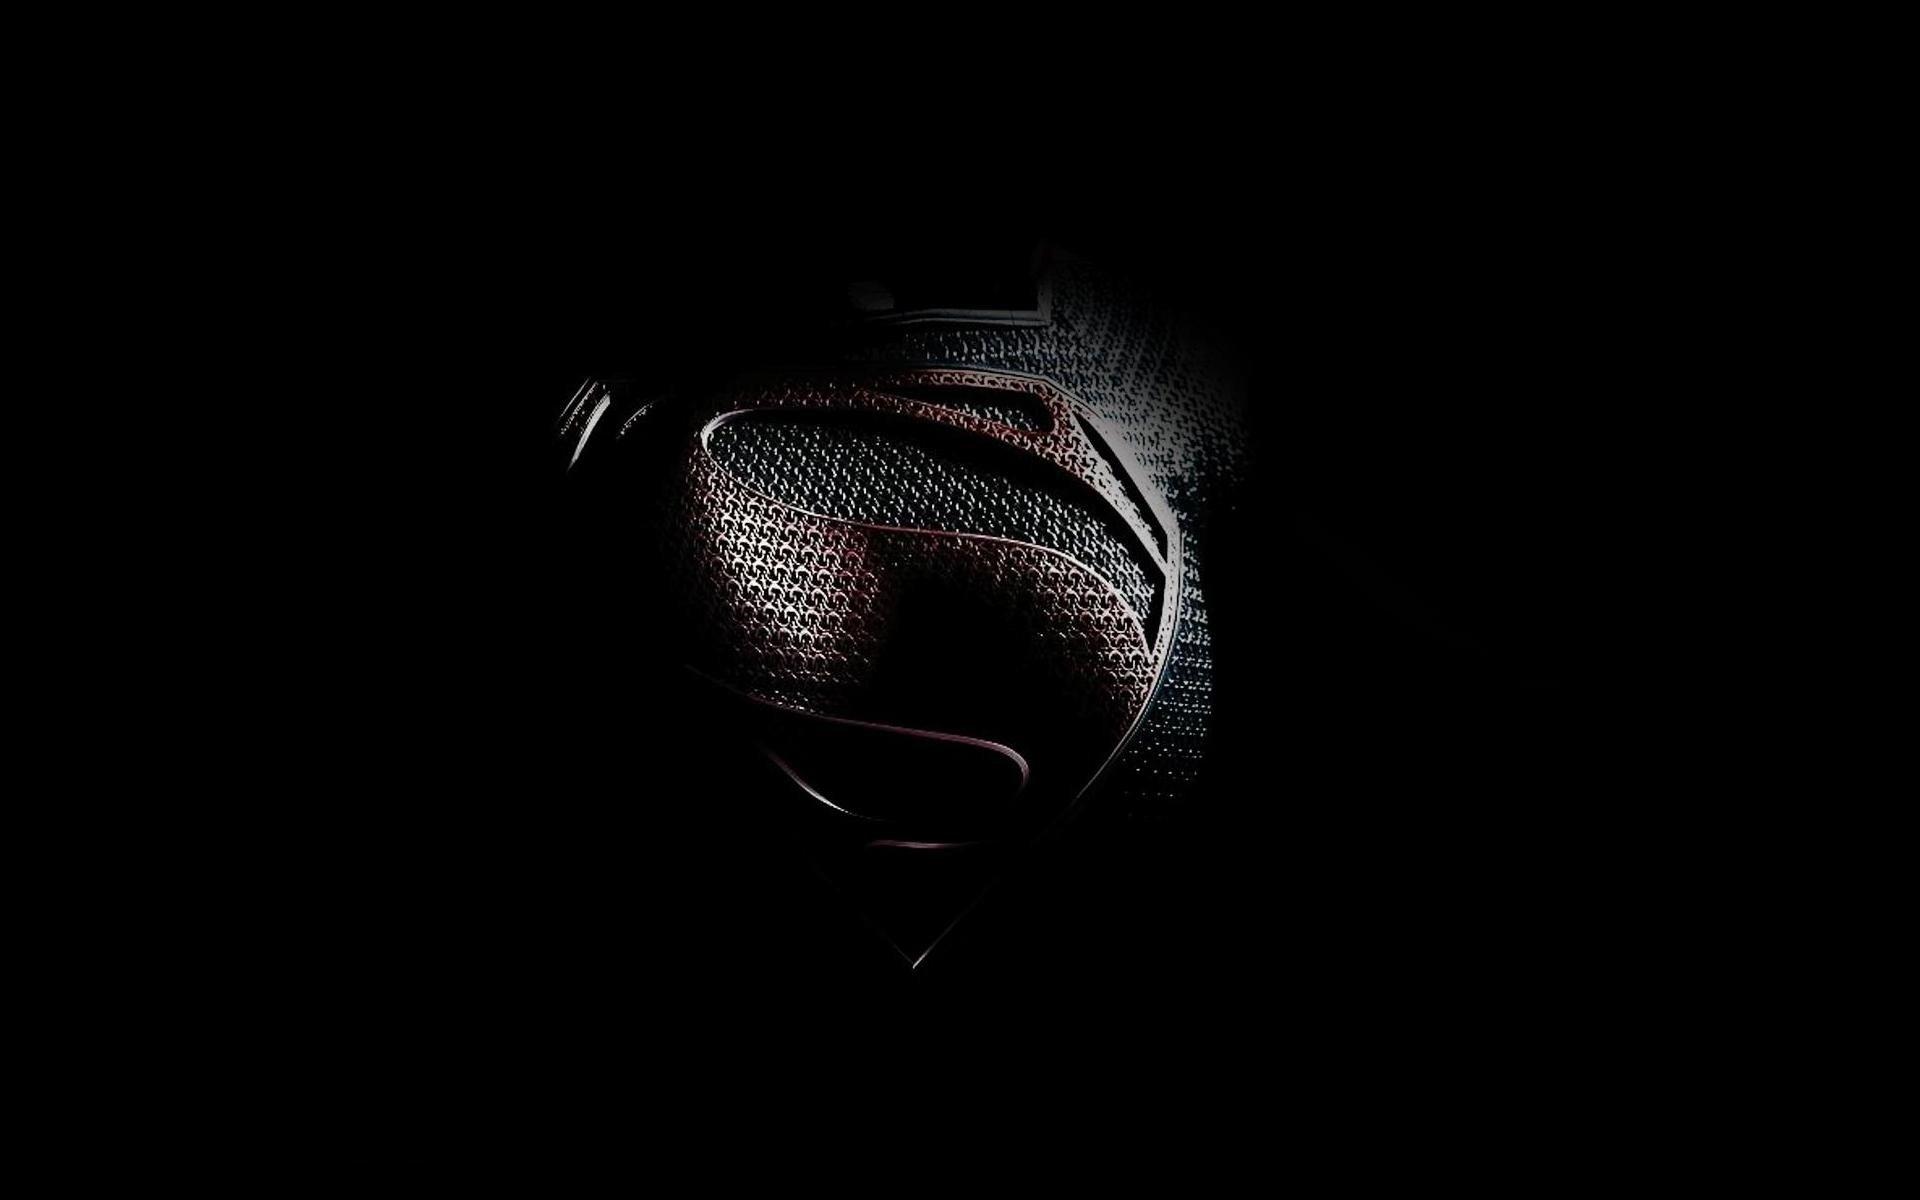 black minimalistic movies Superman Man of Steel movie wallpaper 1920x1200